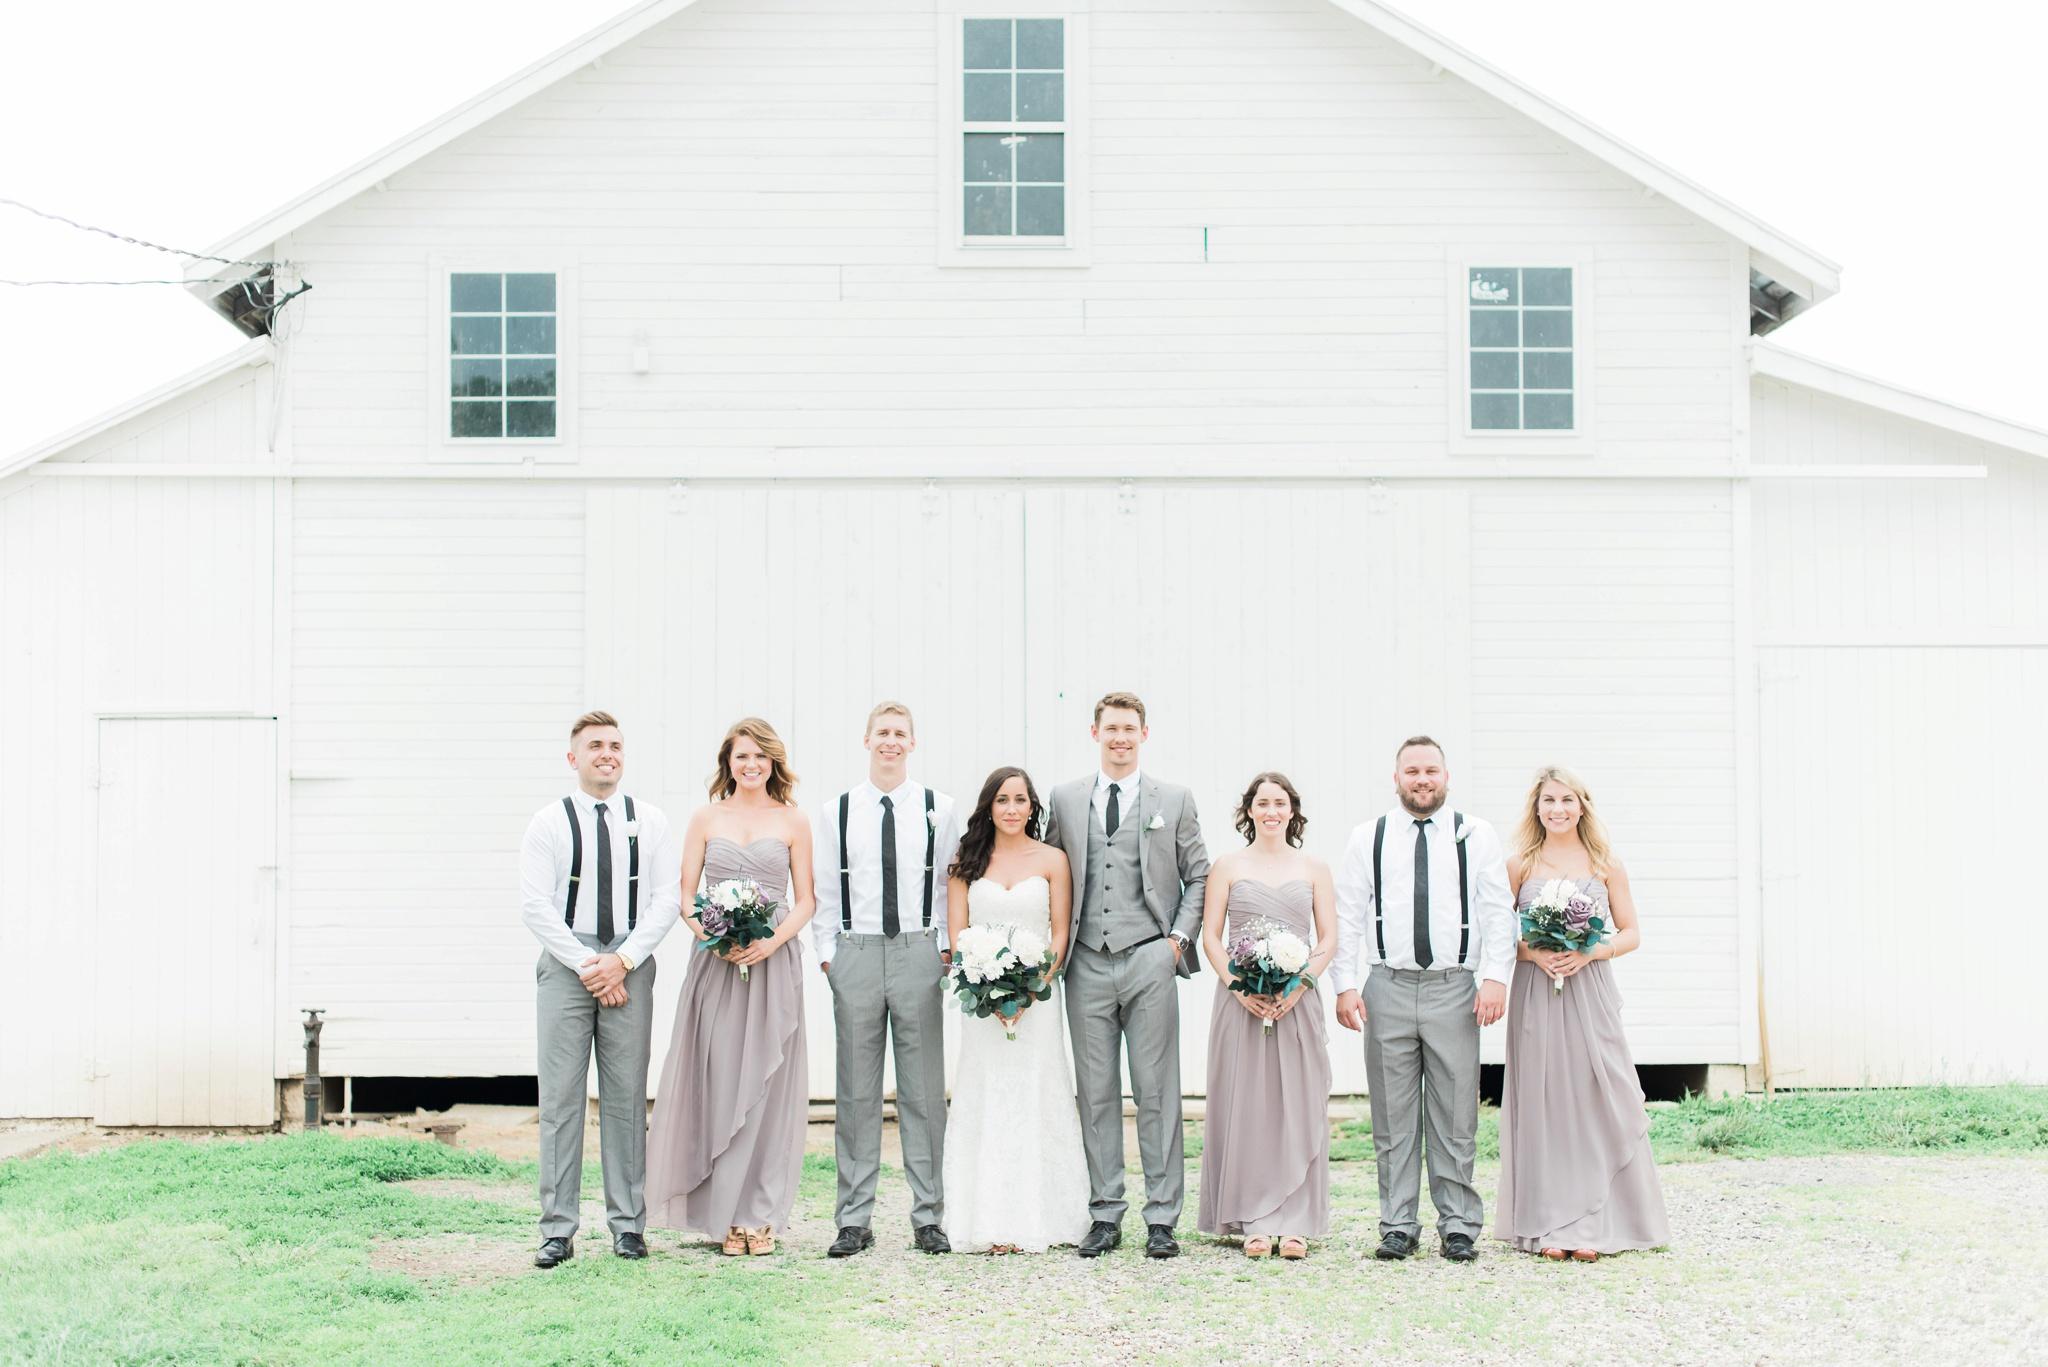 niederman-farm-wedding-cincinnati-ohio-photographer_0065.jpg